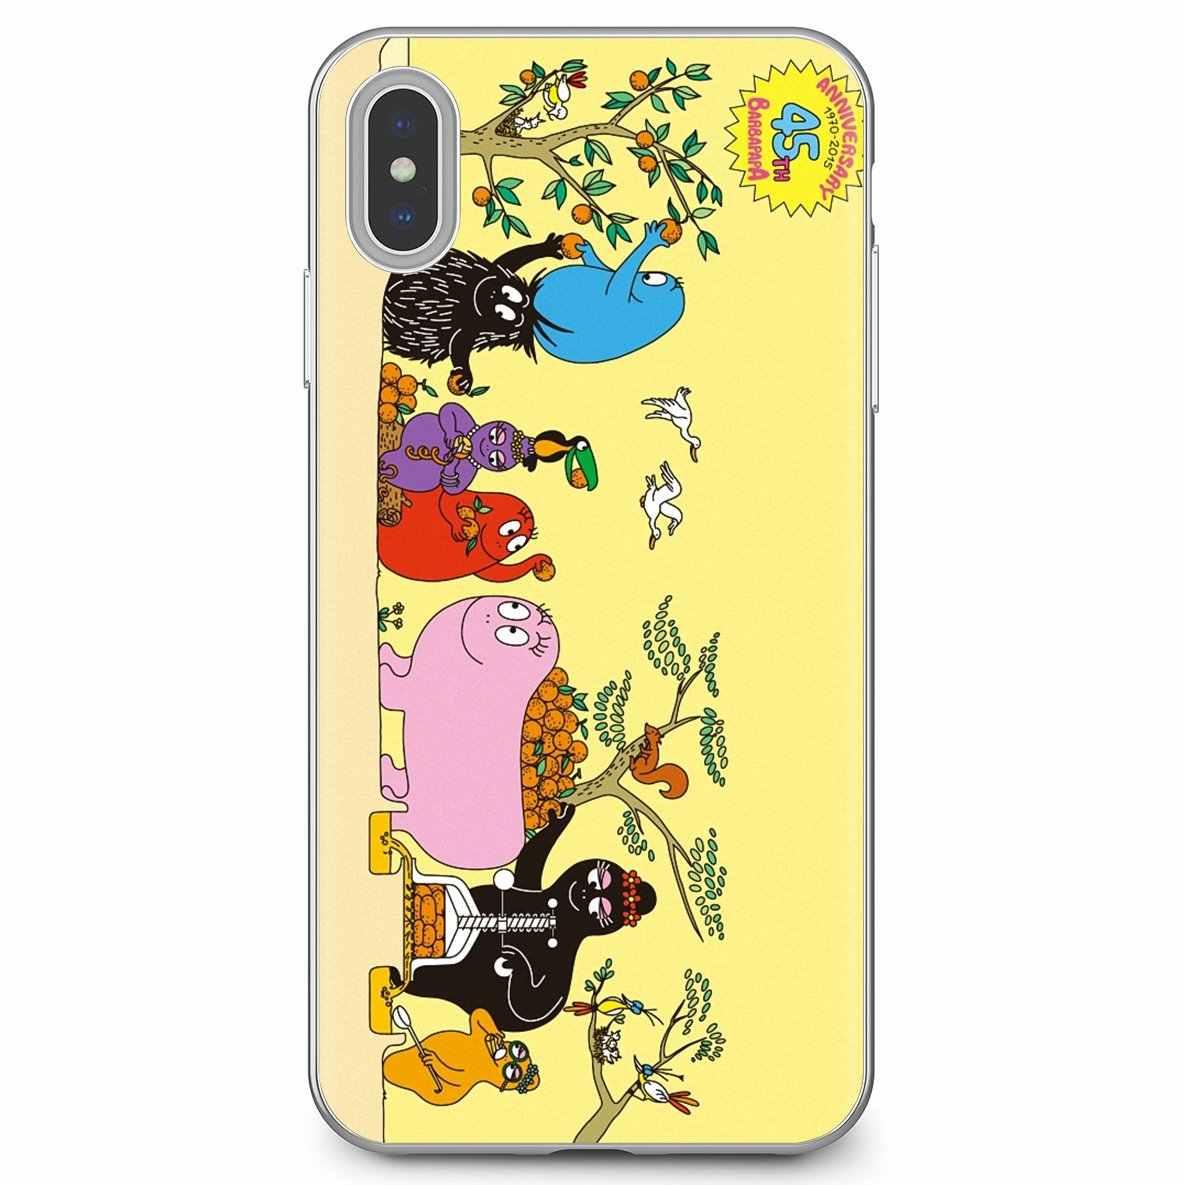 Les Barbapapa Barbamama Rosa Lächeln Silikon Abdeckung Tasche Für Huawei G7 G8 P7 P8 P9 P10 P20 P30 Lite Mini pro P Smart 2017 2018 2019